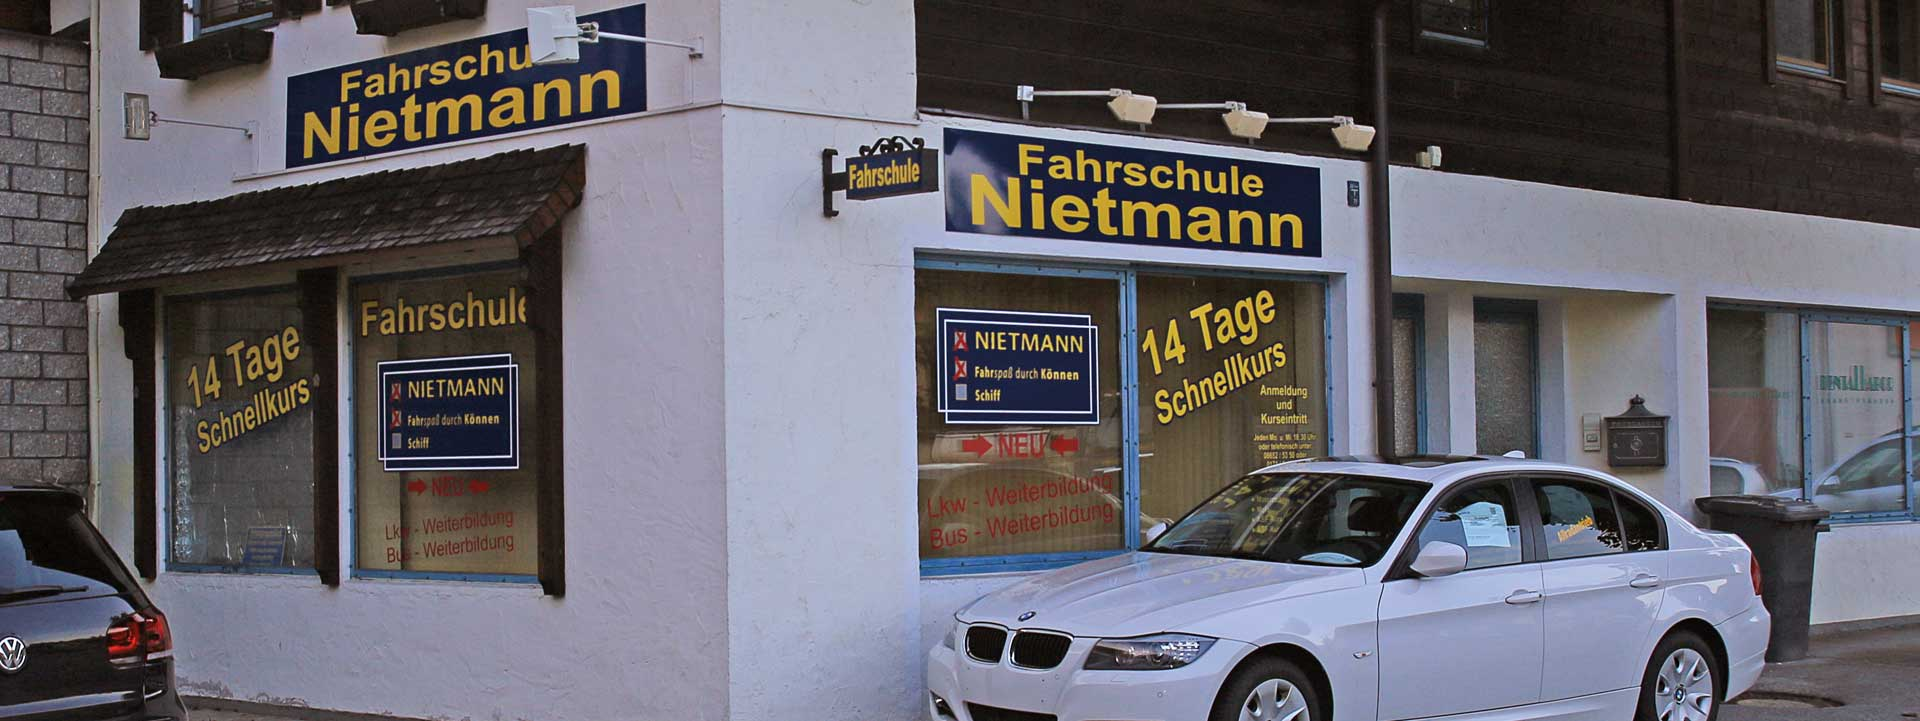 Die Fahrschule Berchtesgaden am Buchwinklerparkplatz